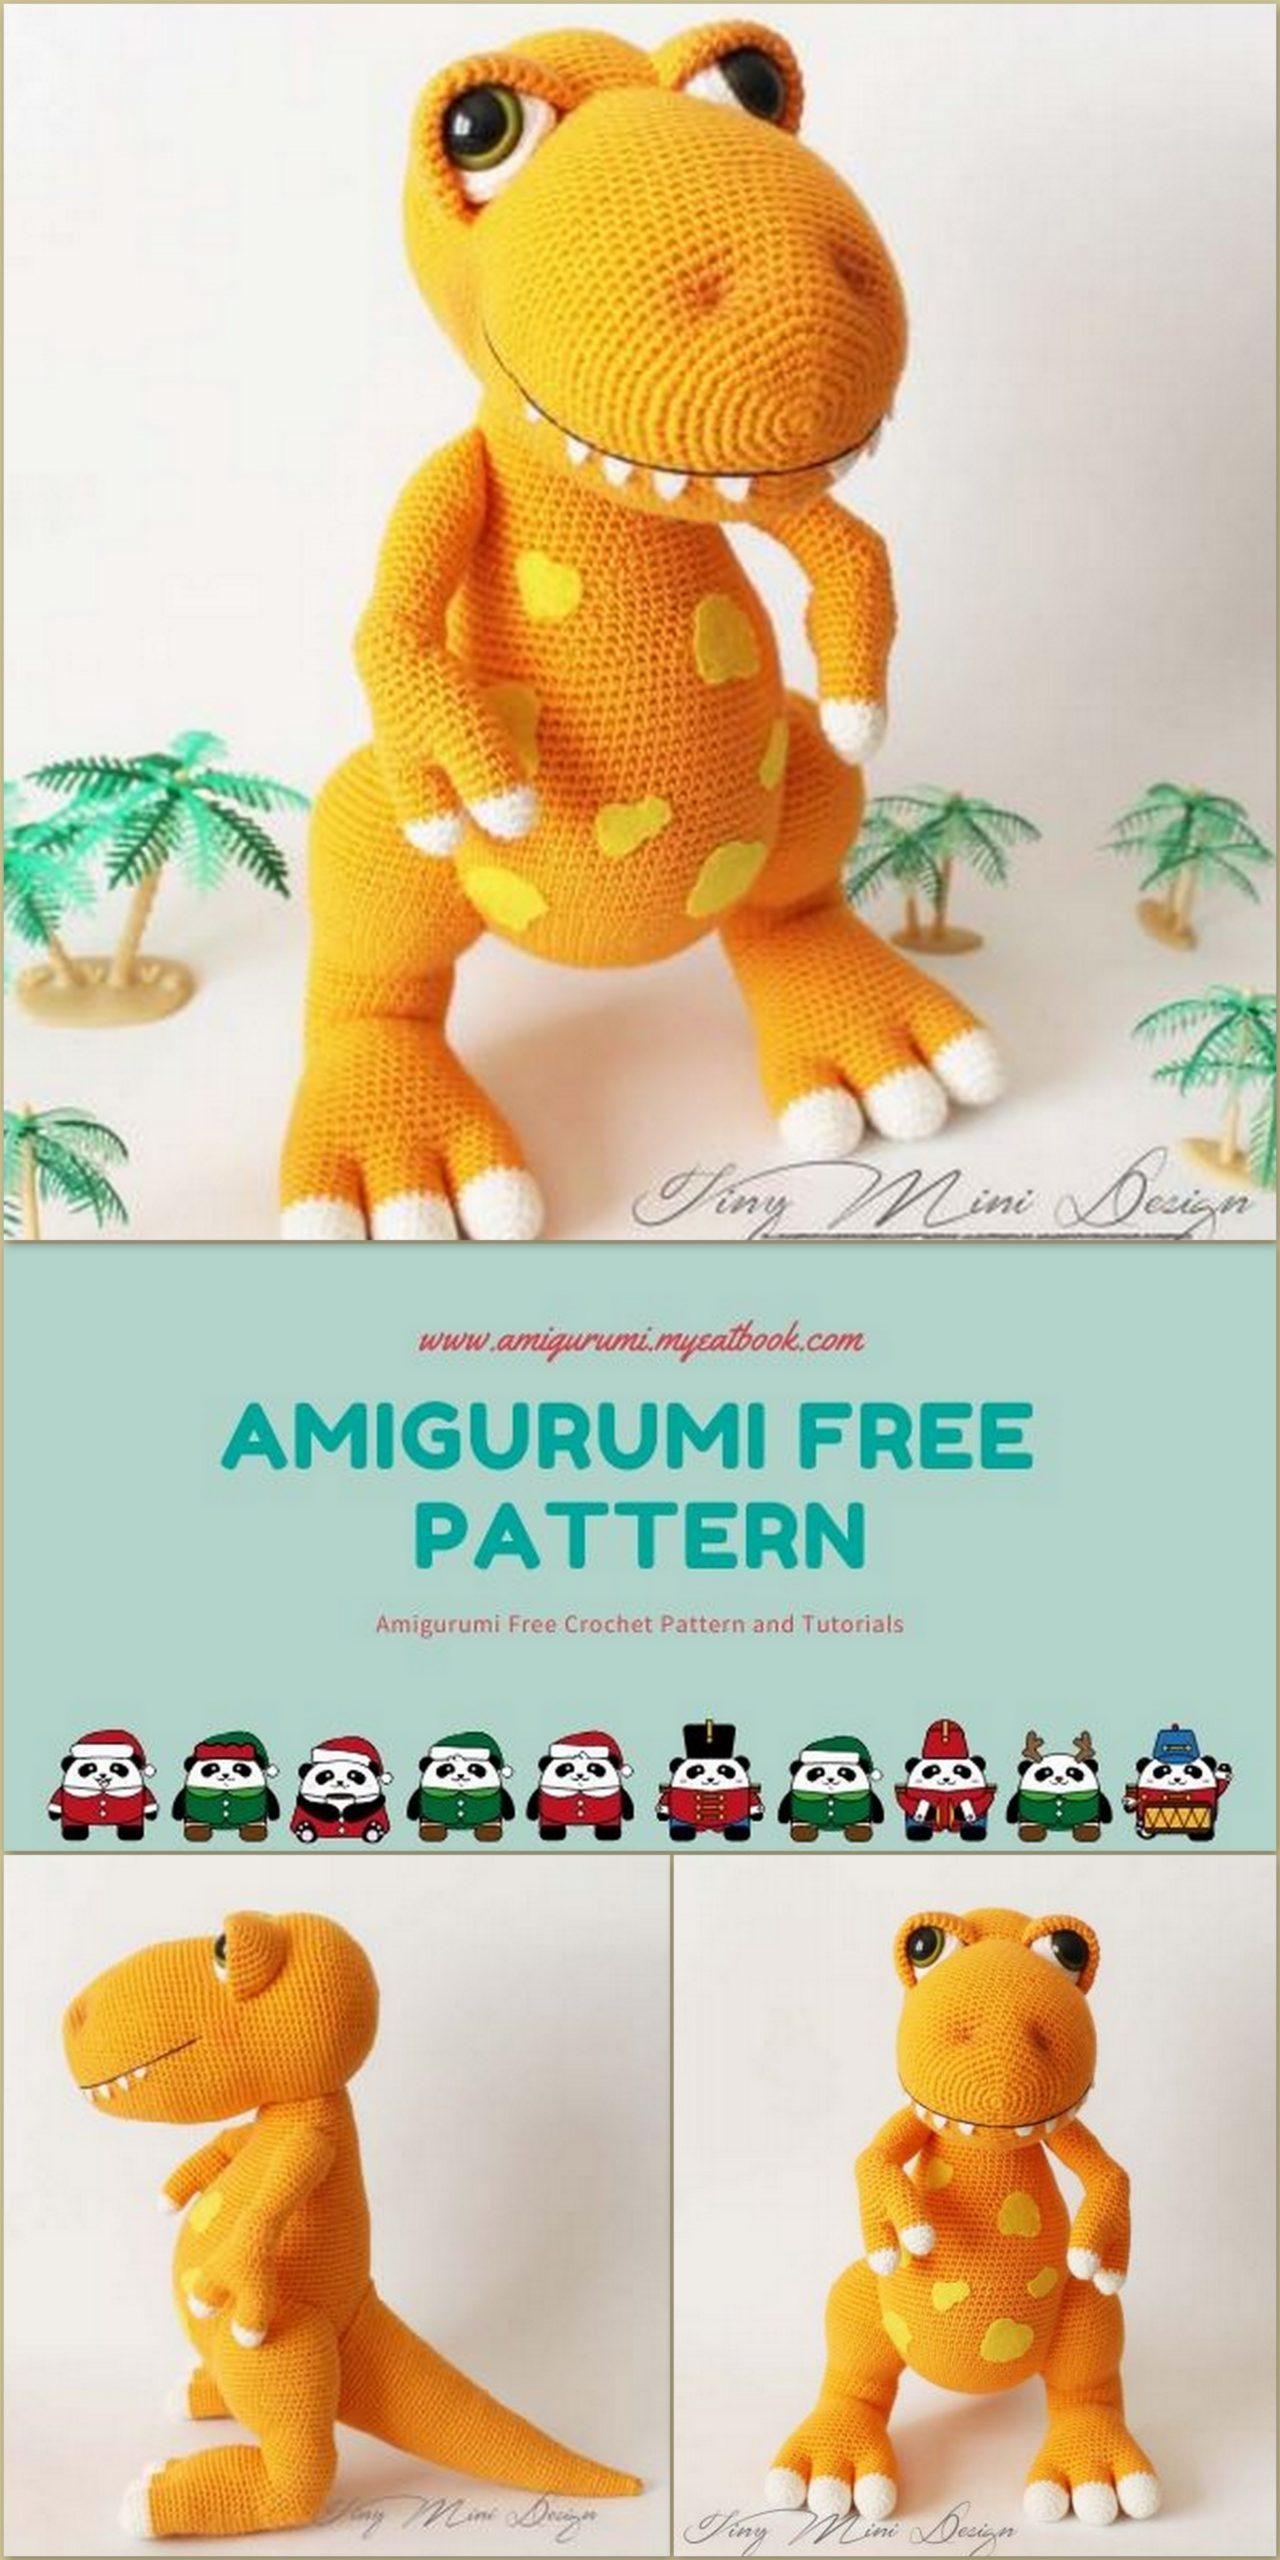 T-REX Dinosaur Crochet Animal Handmade Amigurumi Stuffed Toy Doll ... | 2560x1280